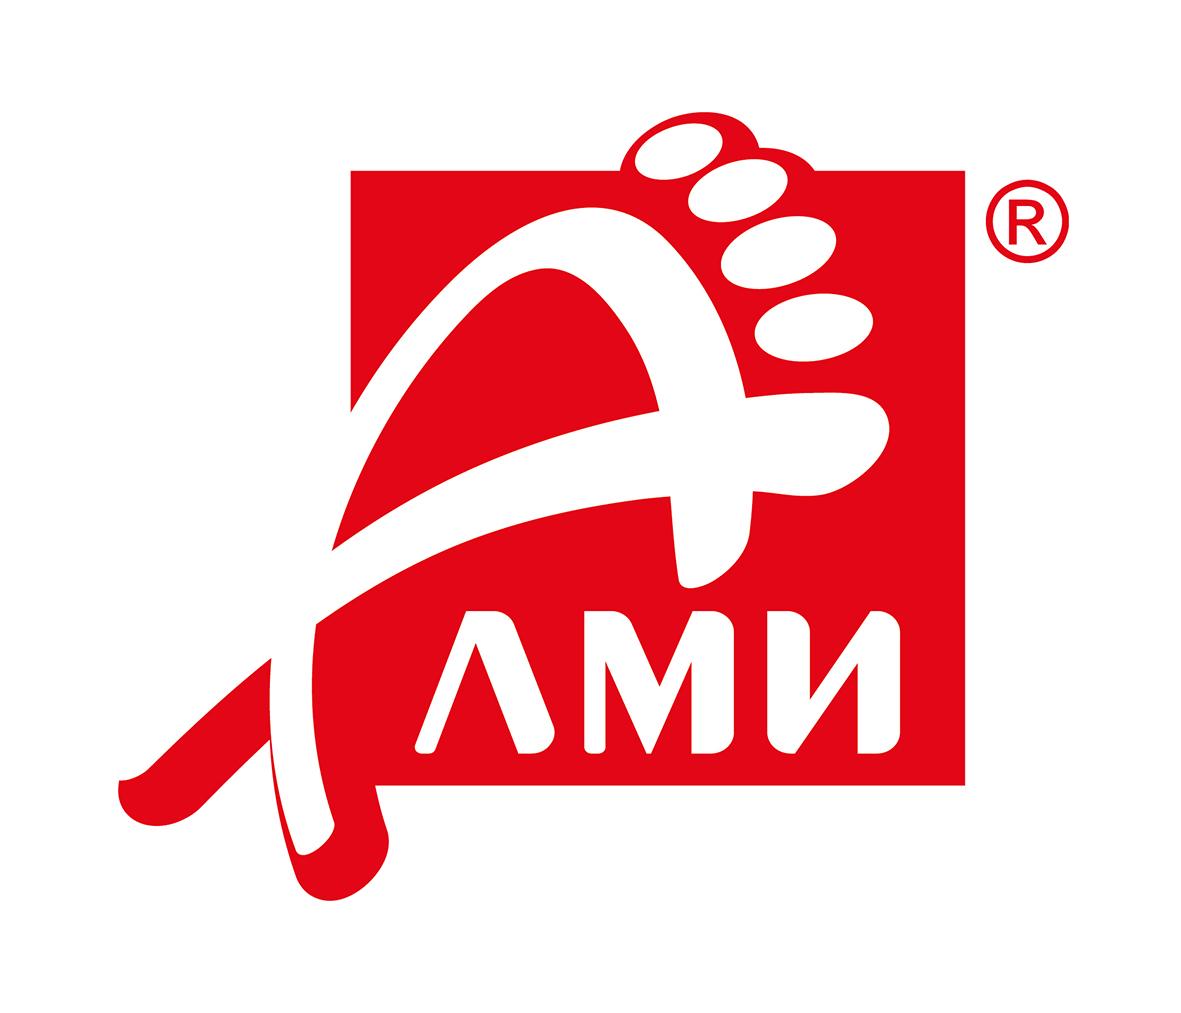 Дизайн логотипа обувной марки Алми фото f_17259f7639cdd0c3.jpg